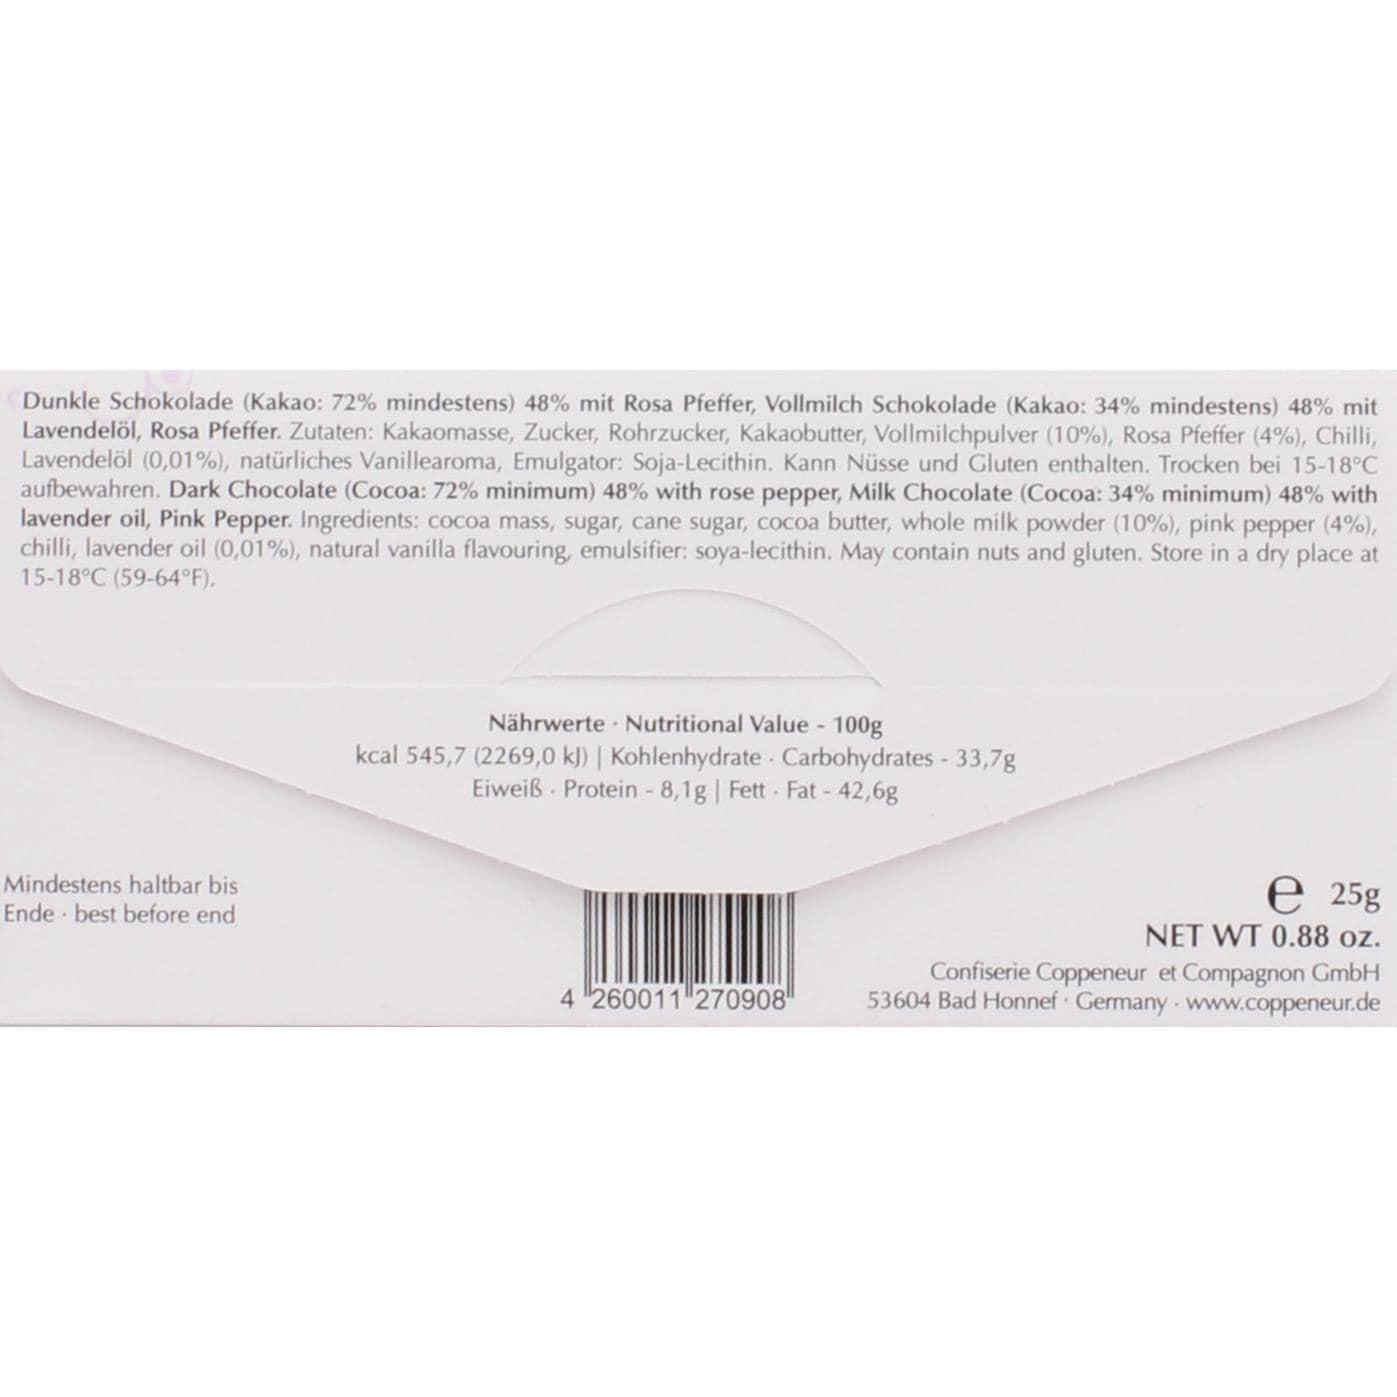 Coppeneur - Schokolade Rosa Pfeffer u. Lavendel - Schokoladentafel - 25g